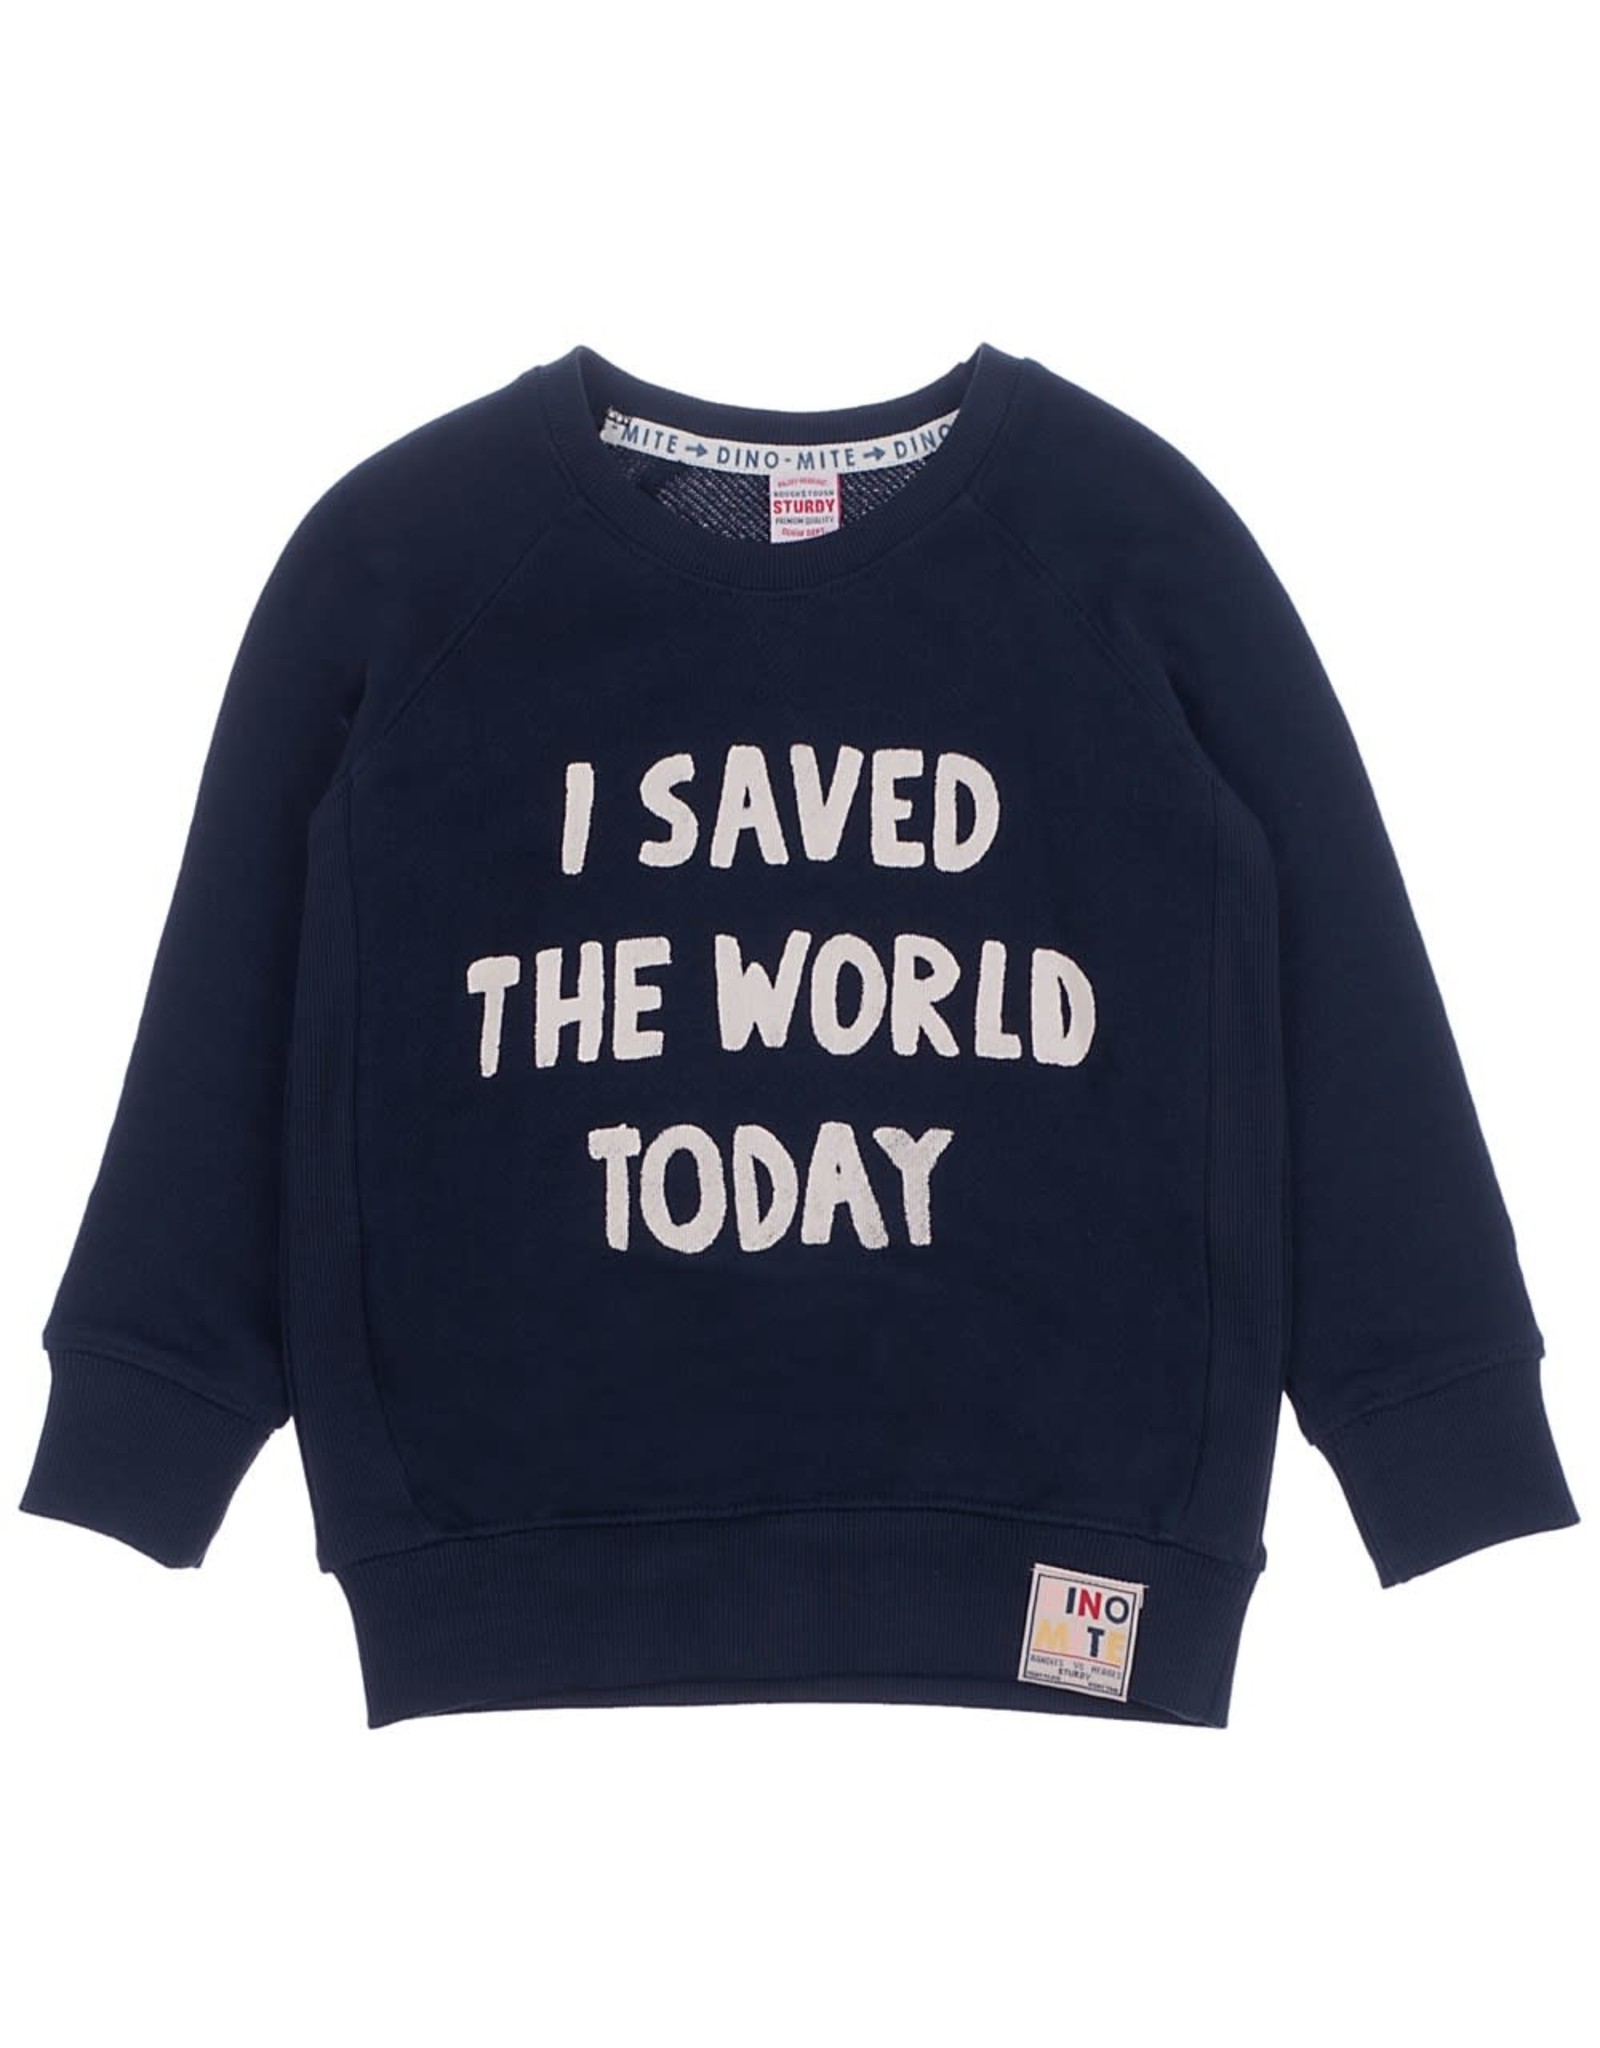 Sturdy Sweater I Saved - Dino-mite